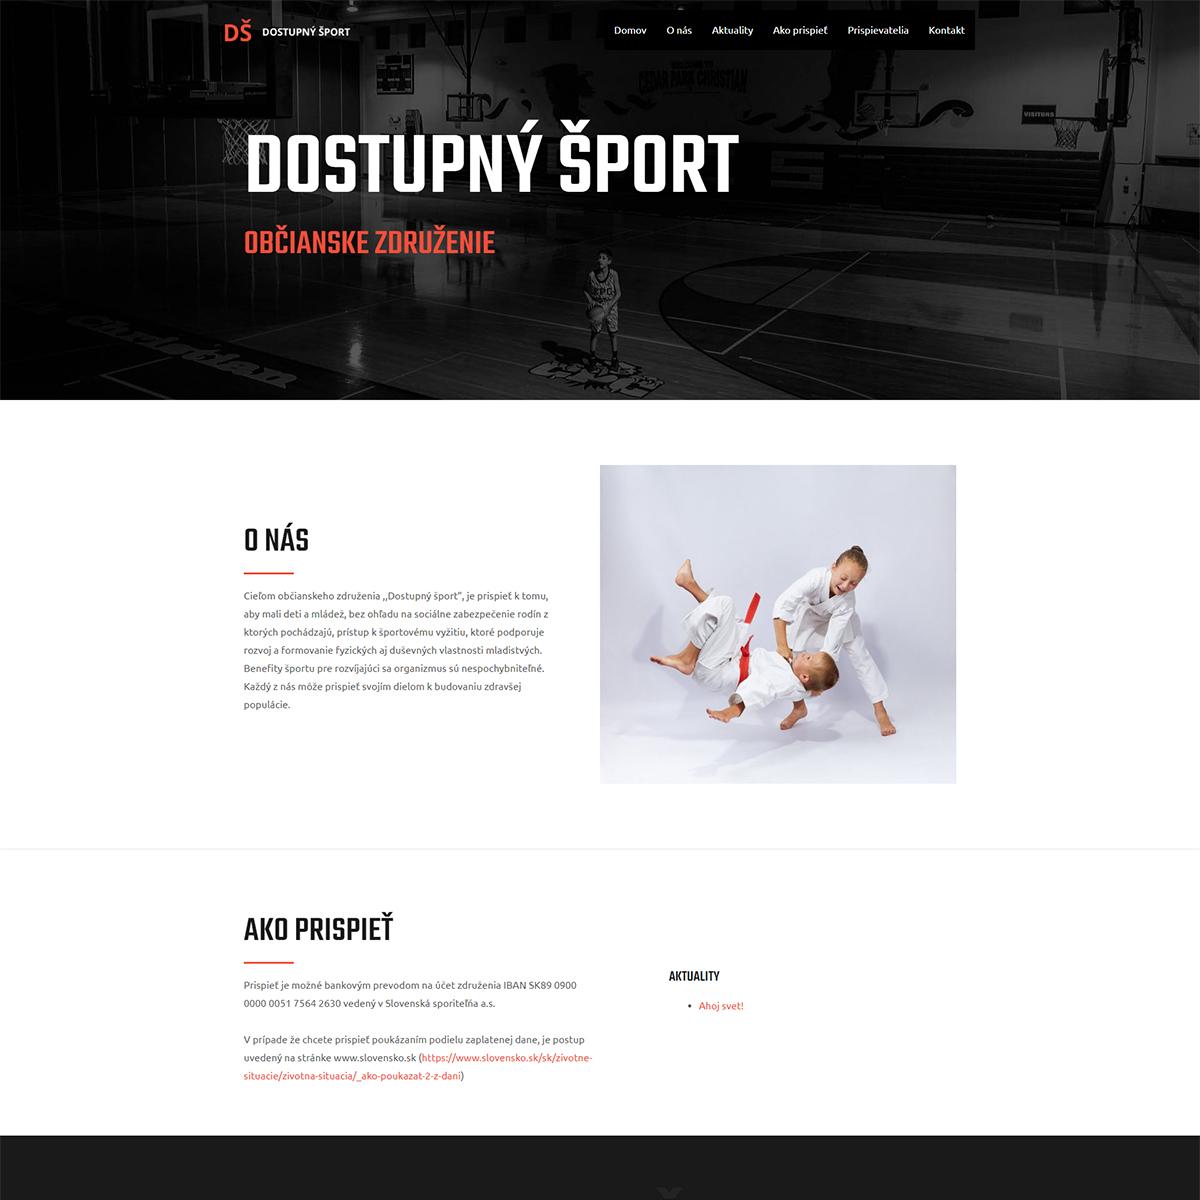 dostupny_sport